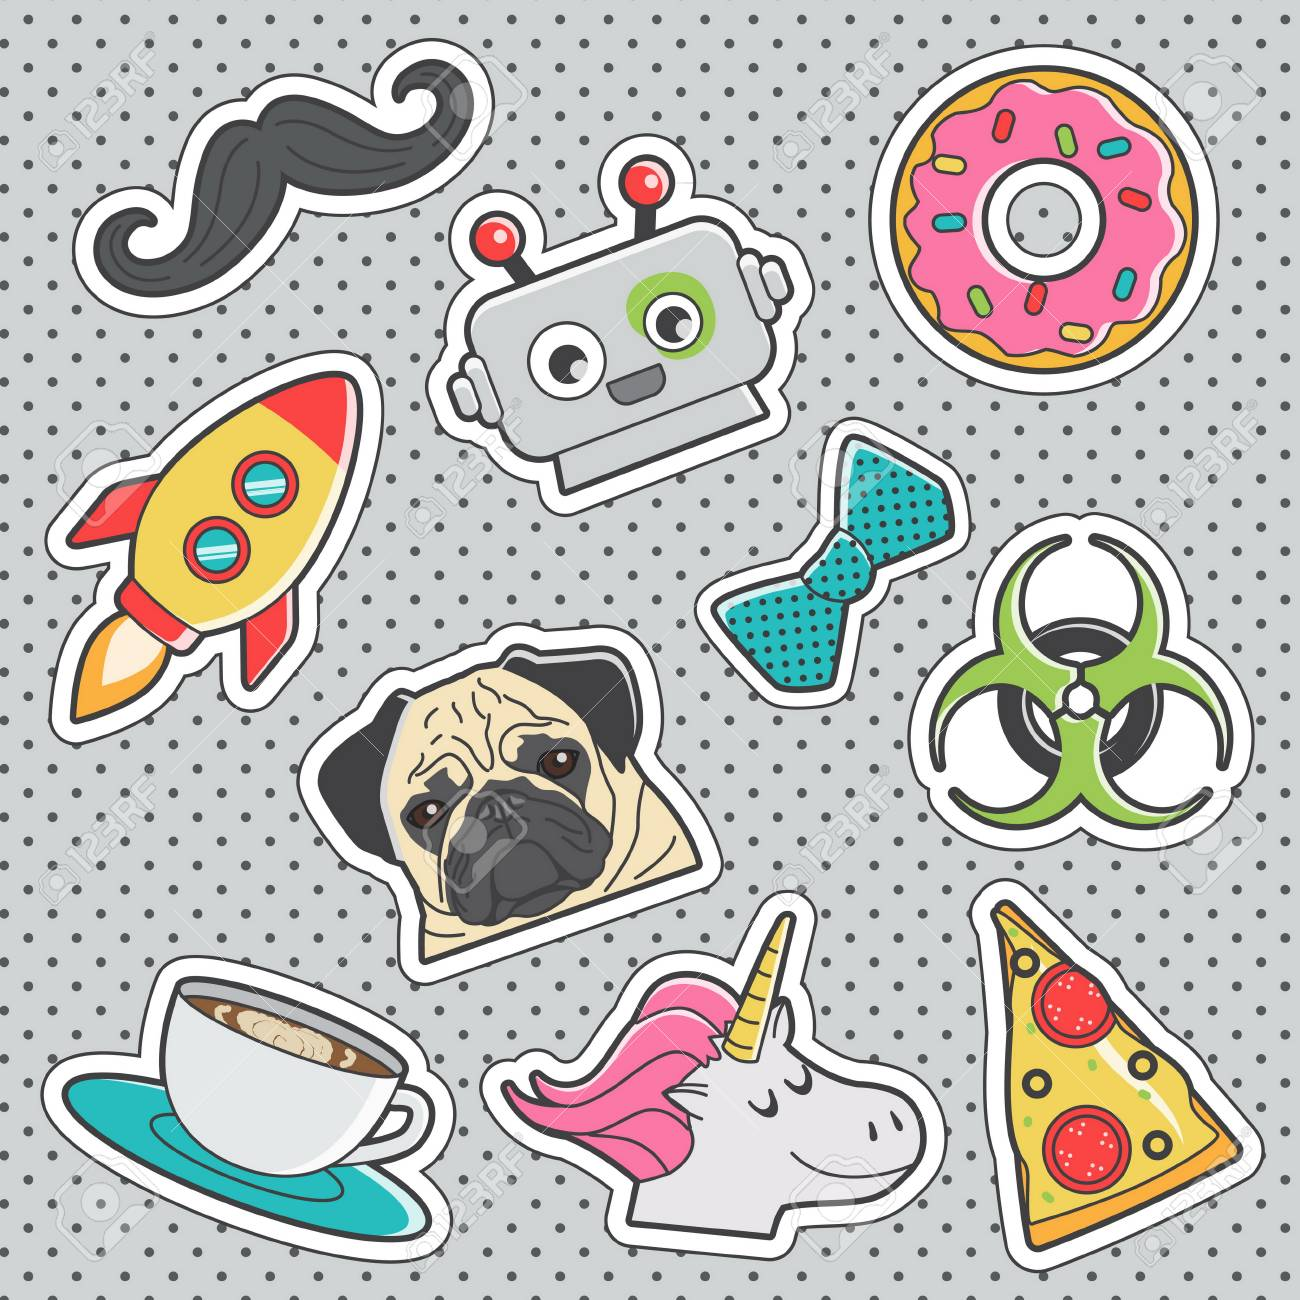 Set of fun trendy vintage sticker fashion badges withunicorn,